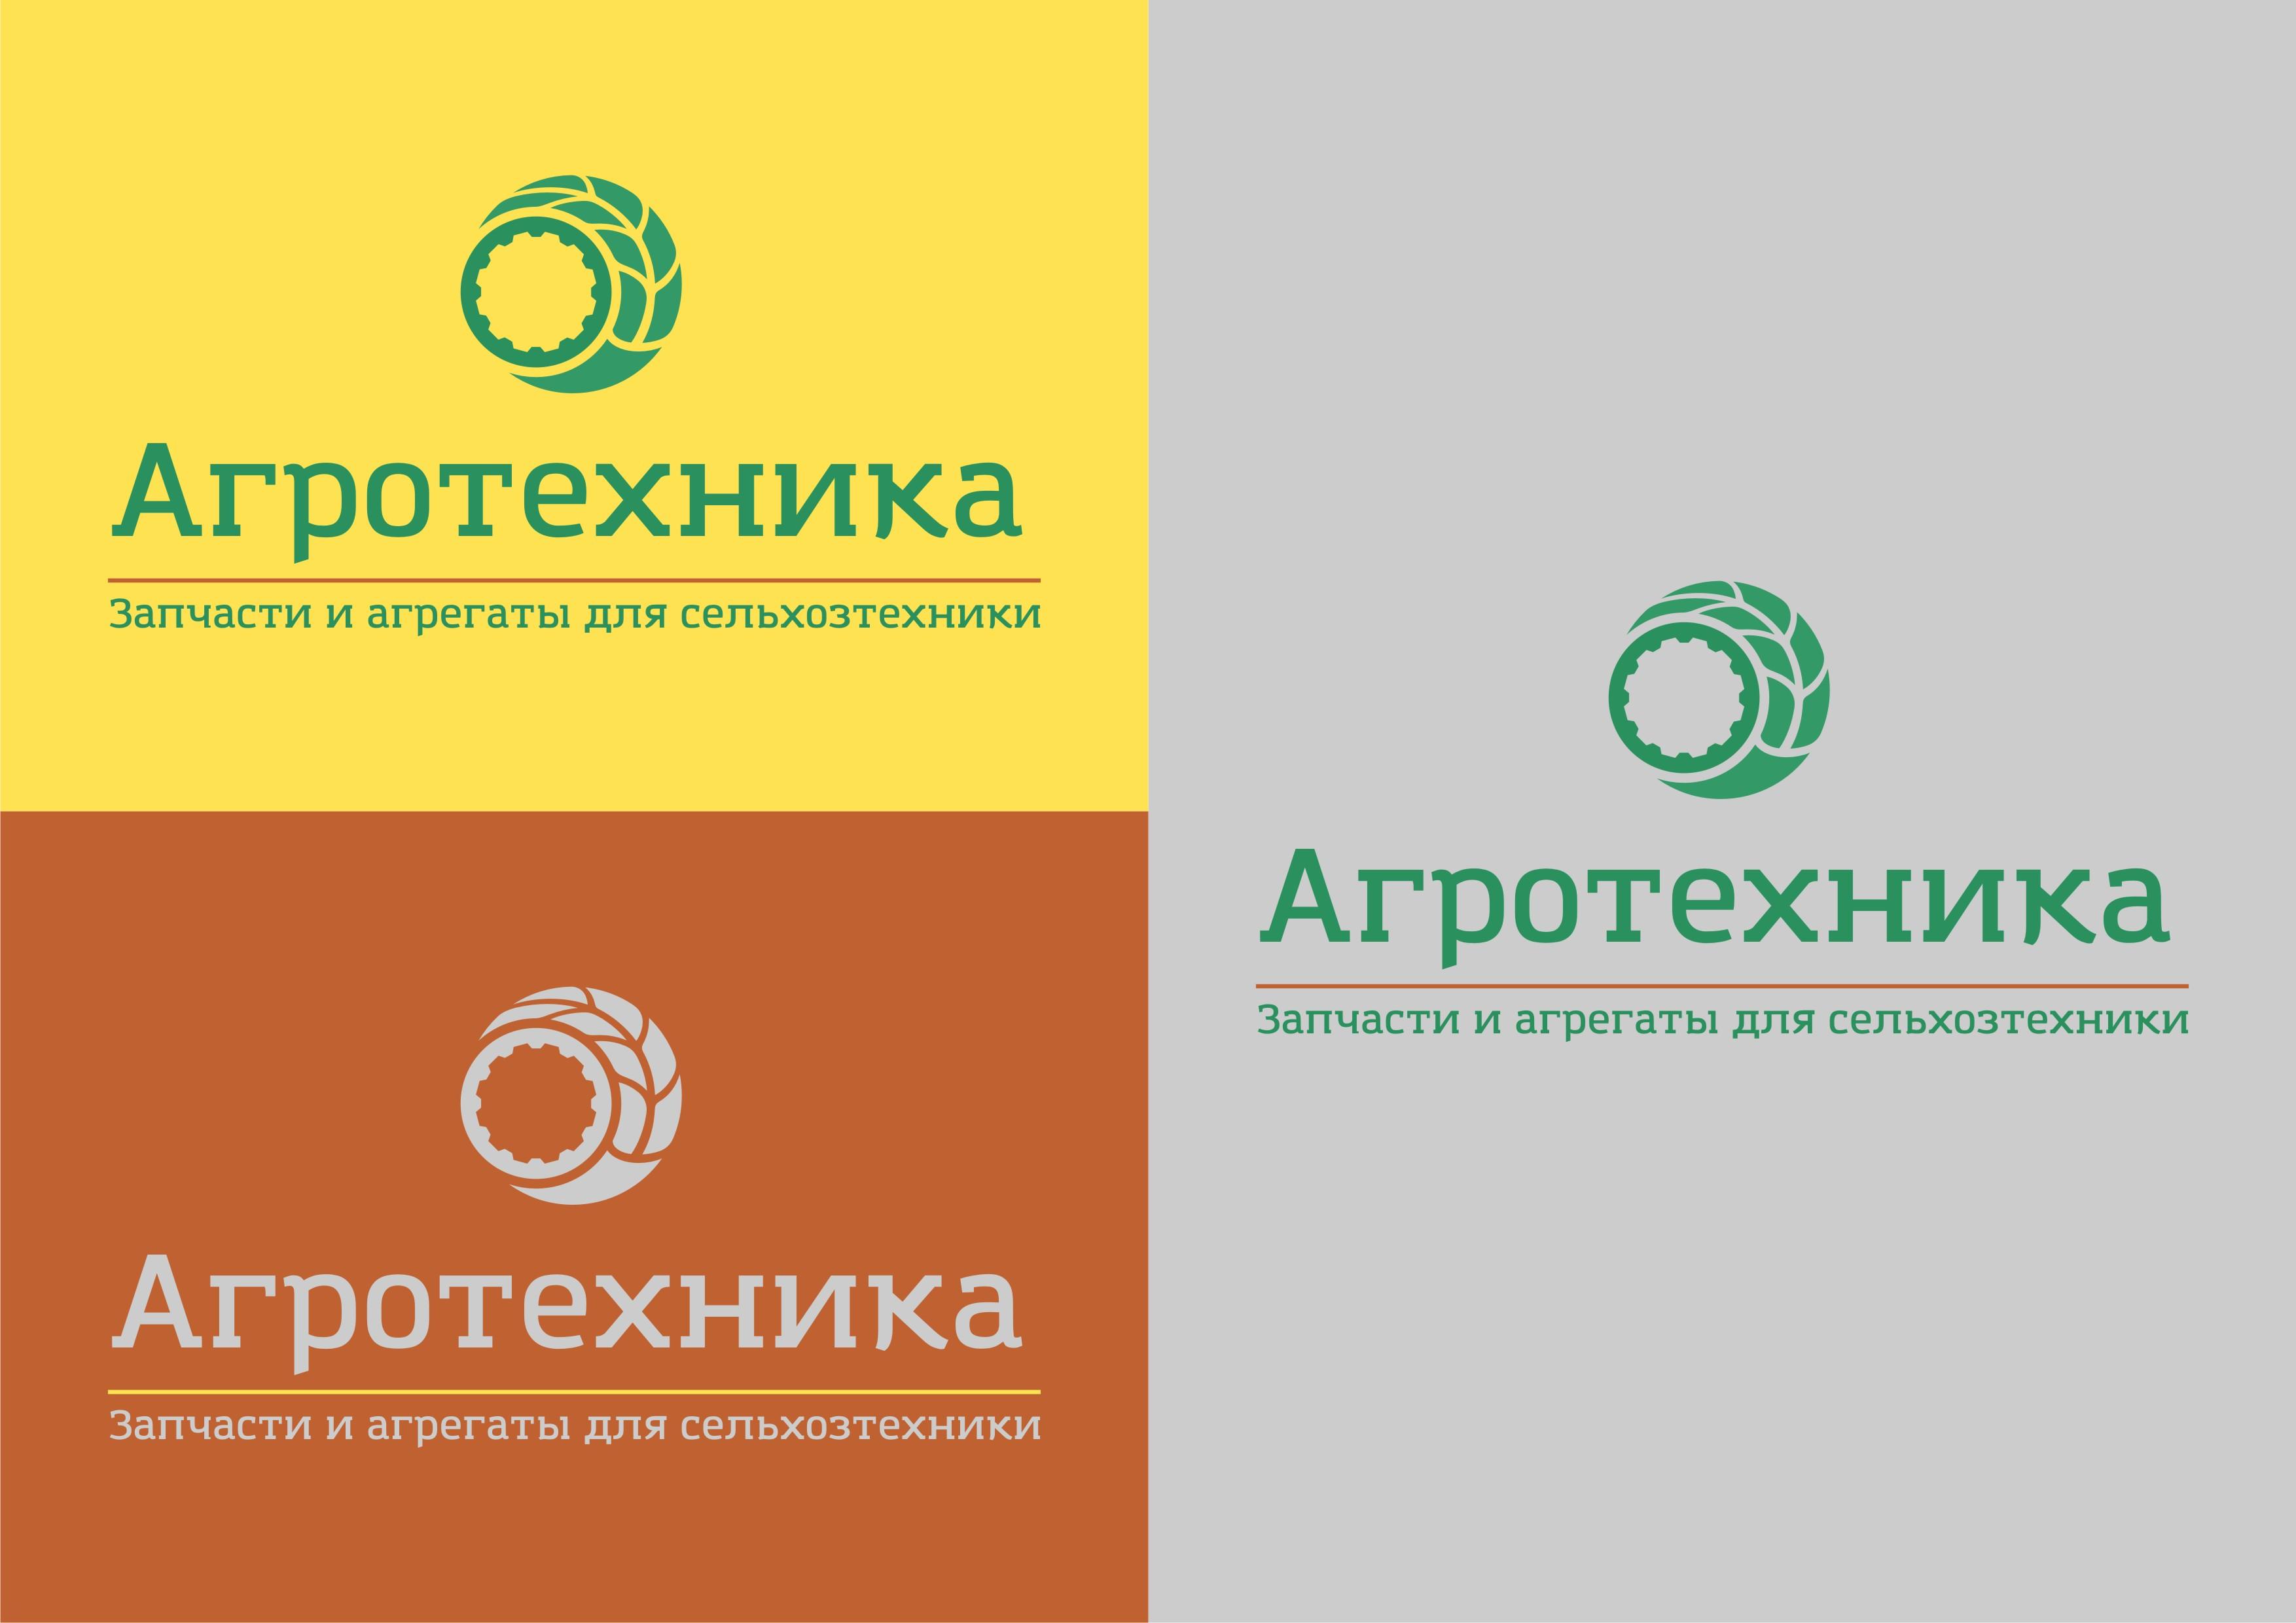 Разработка логотипа для компании Агротехника фото f_7435c09b4c7618f9.jpg